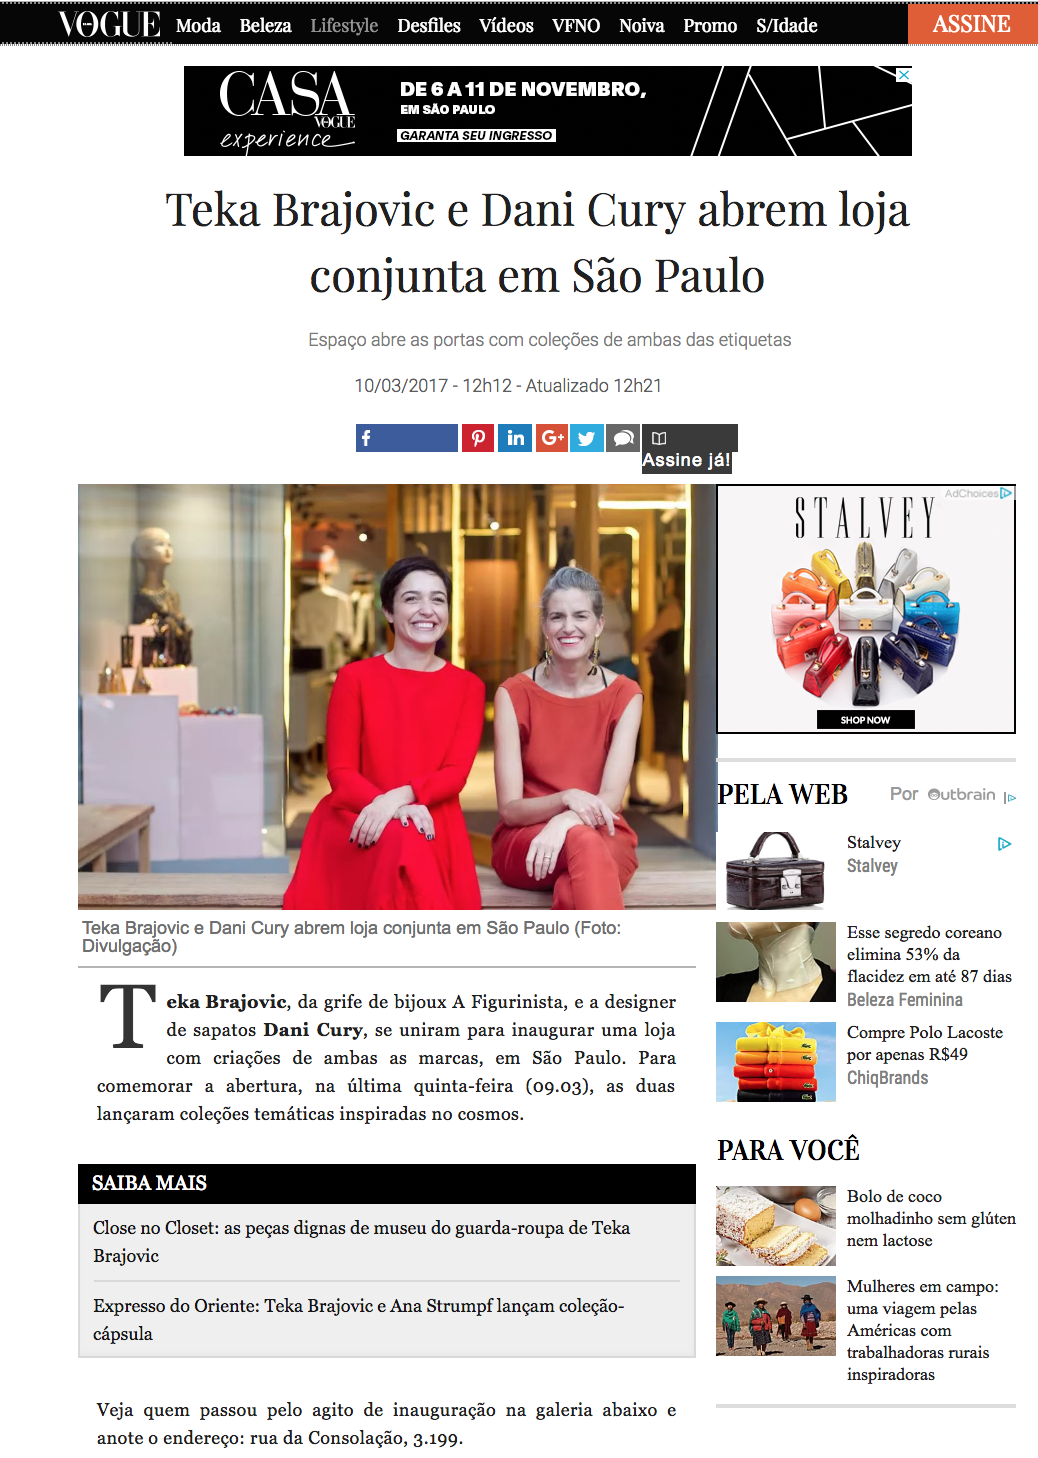 Vogue - Mar 2017